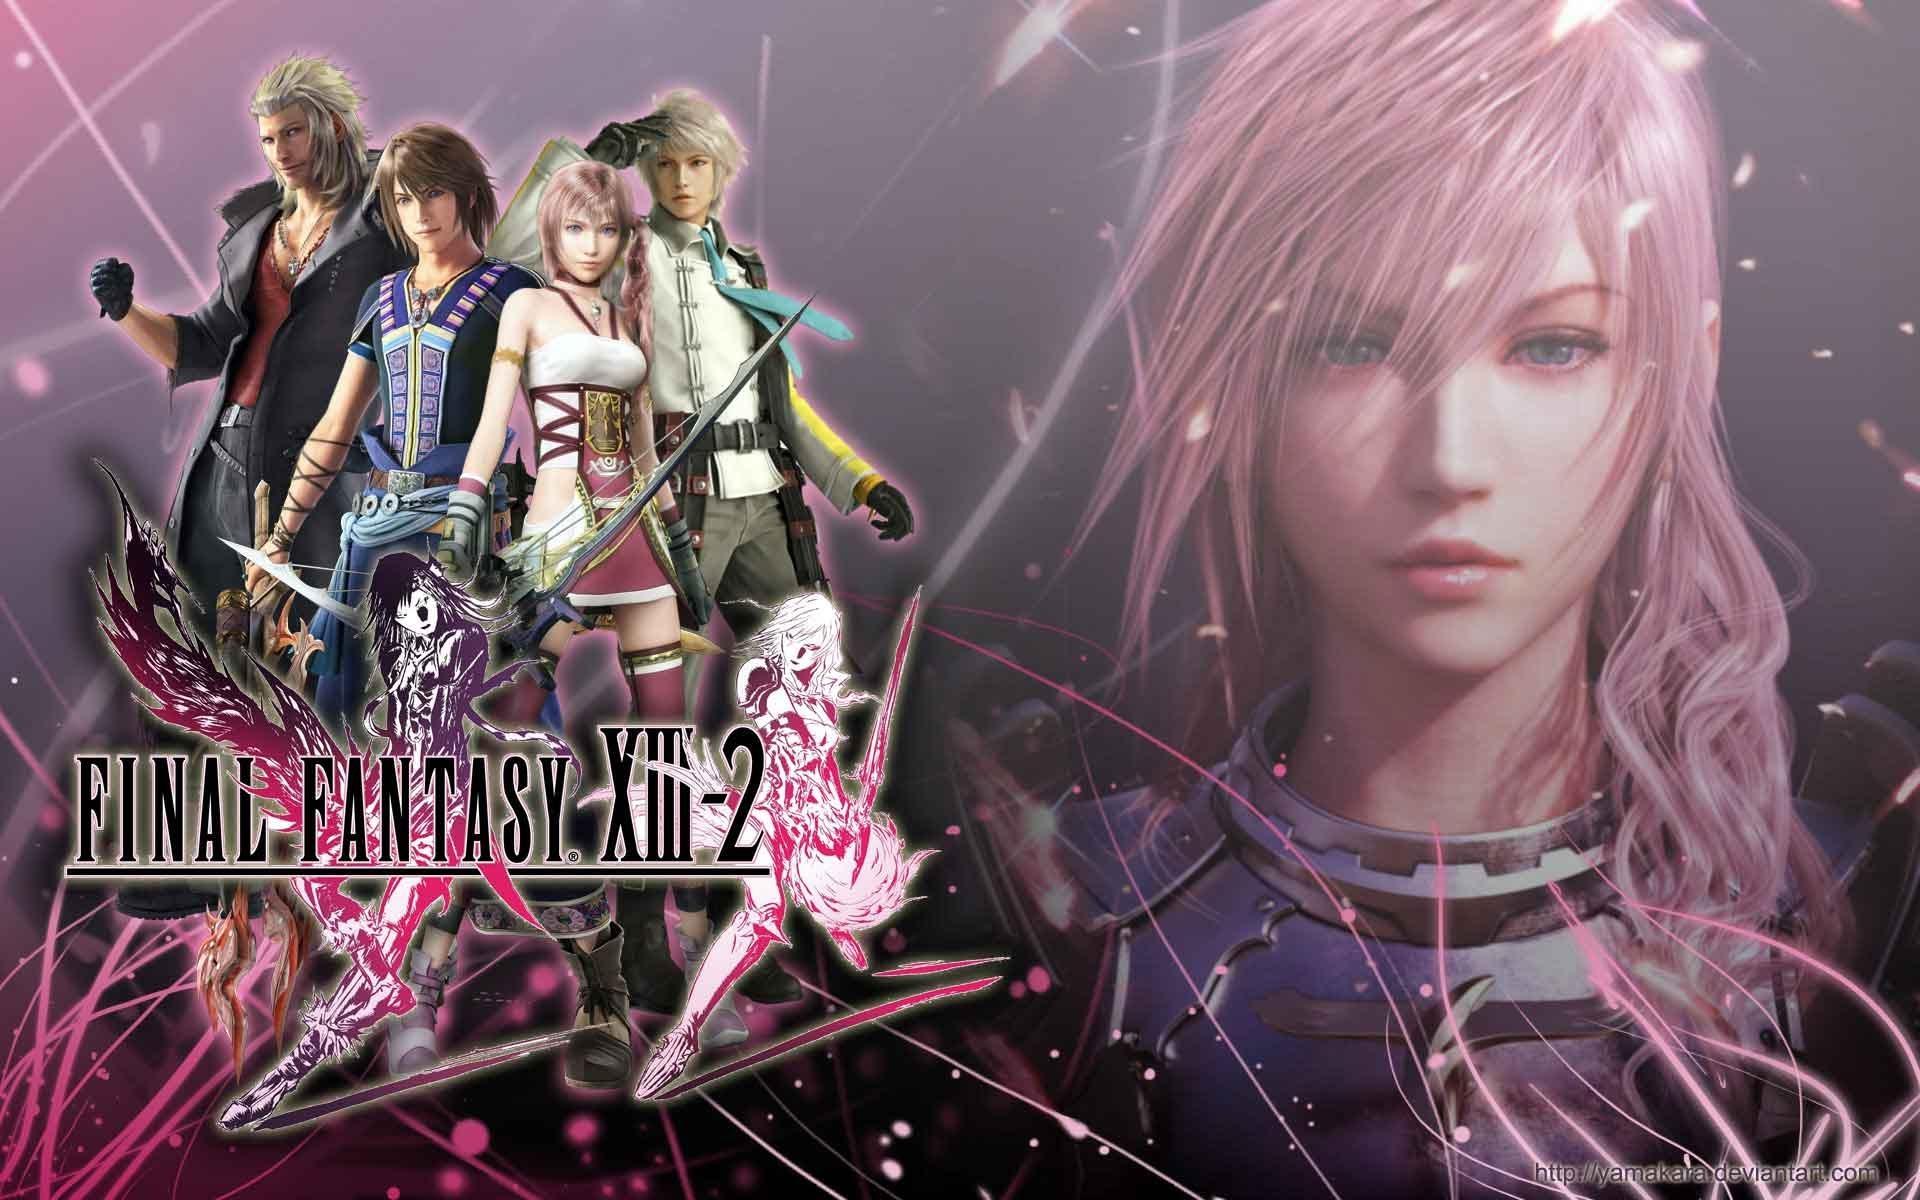 Final Fantasy 13 2 Wallpaper: Final Fantasy 13 Wallpaper Hd